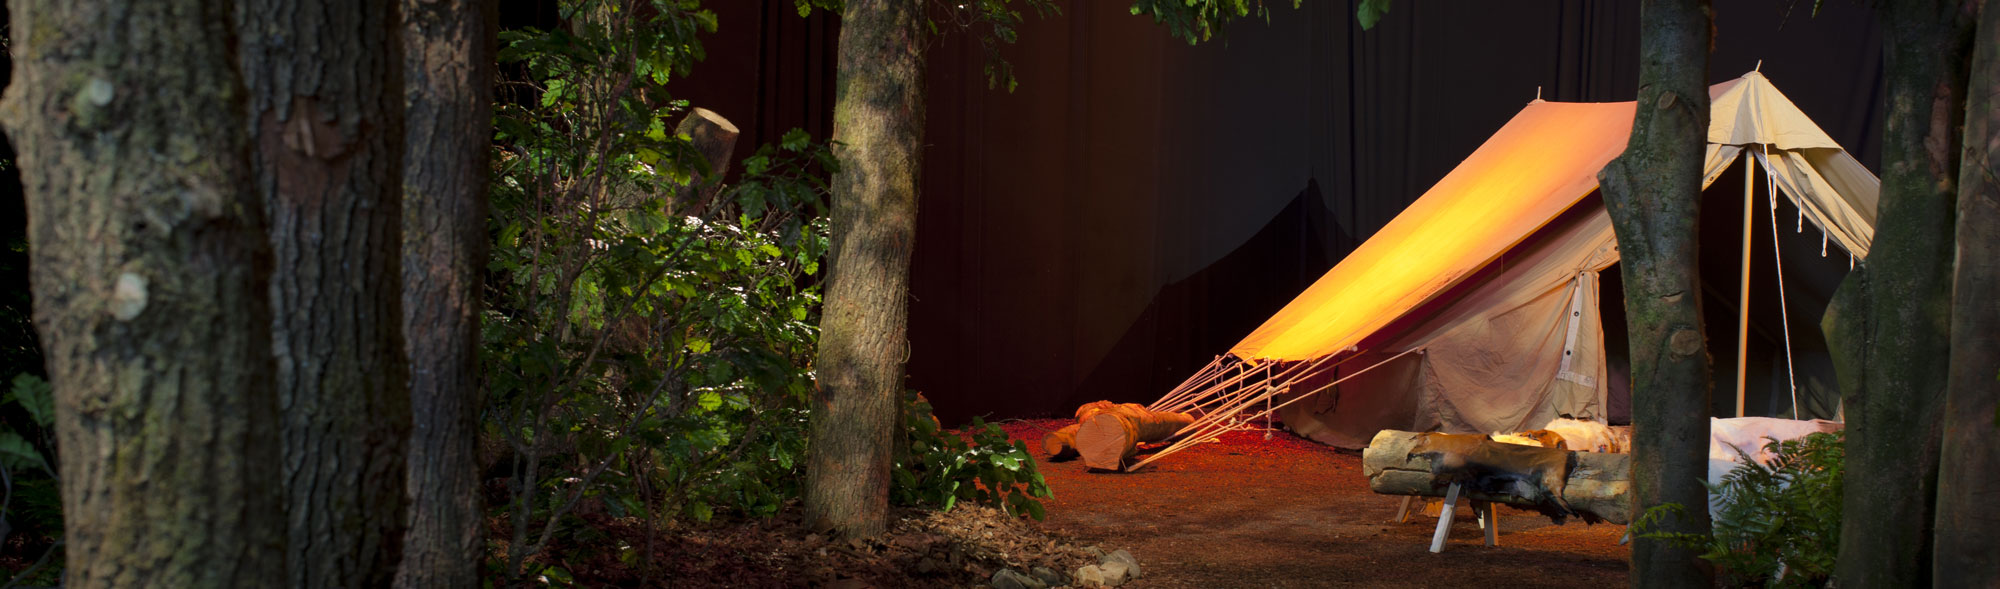 tent_stremer.jpg